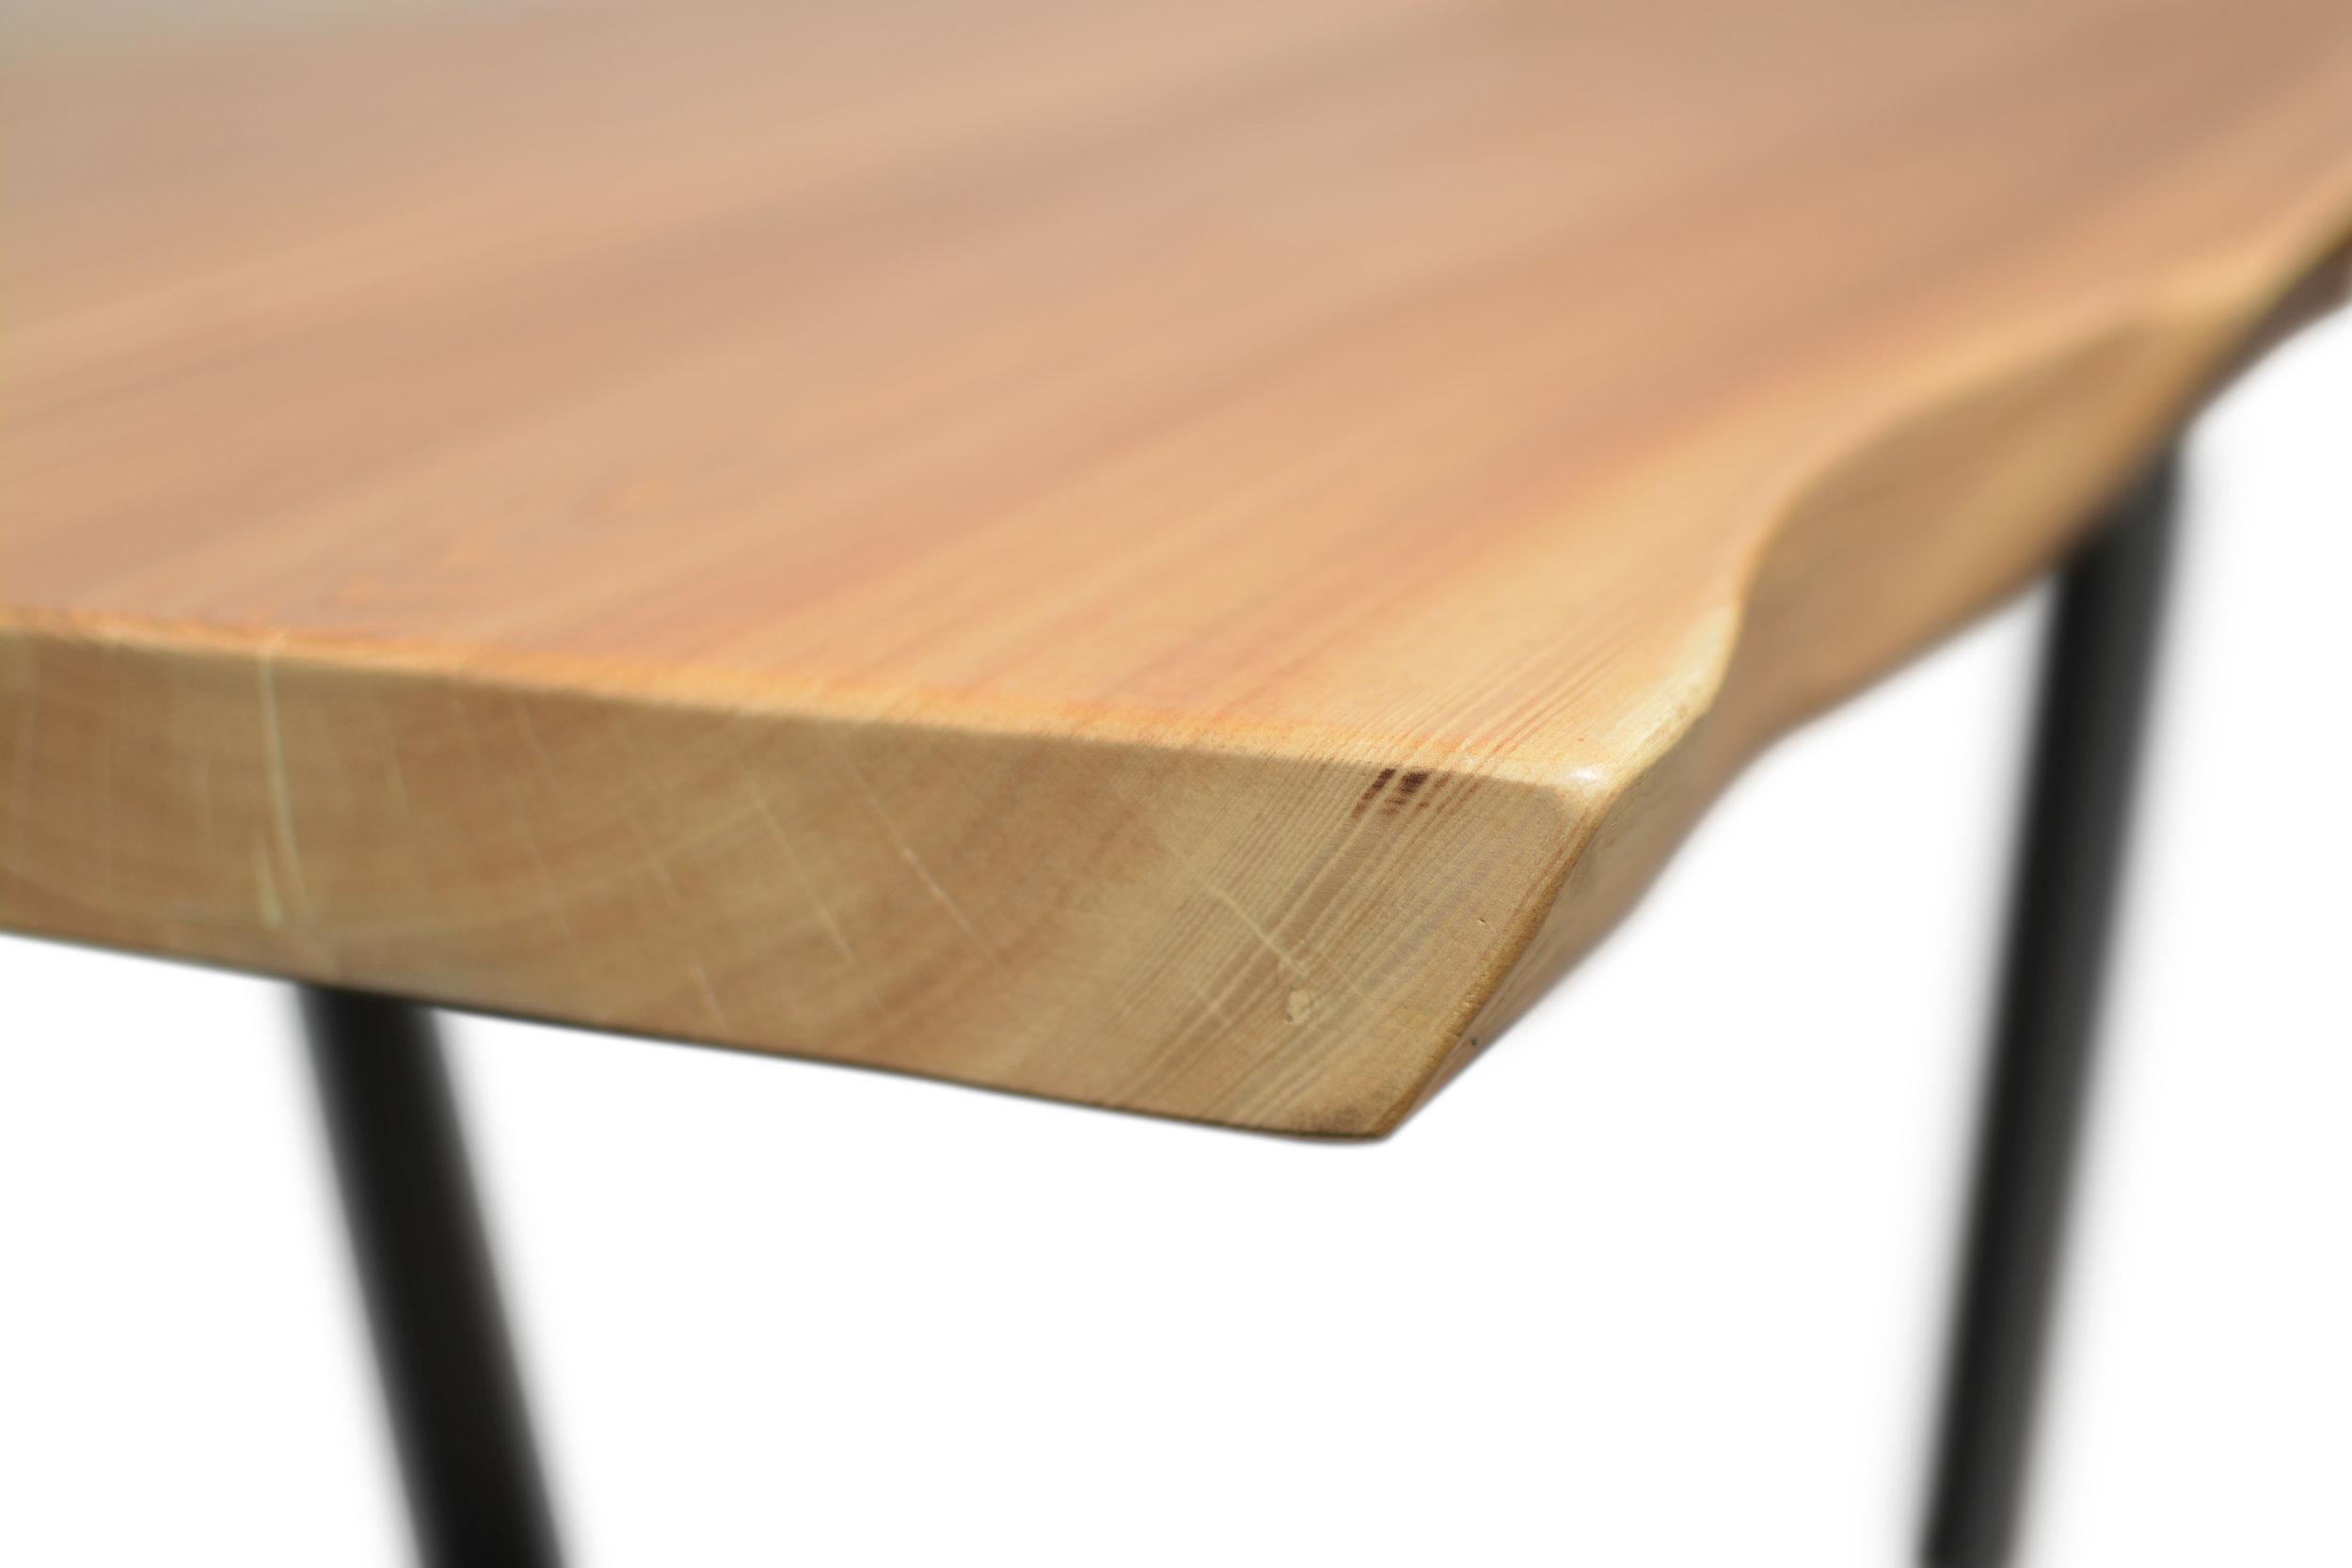 Etz & Steel Wave Live Edge Table Close Up 15.JPG